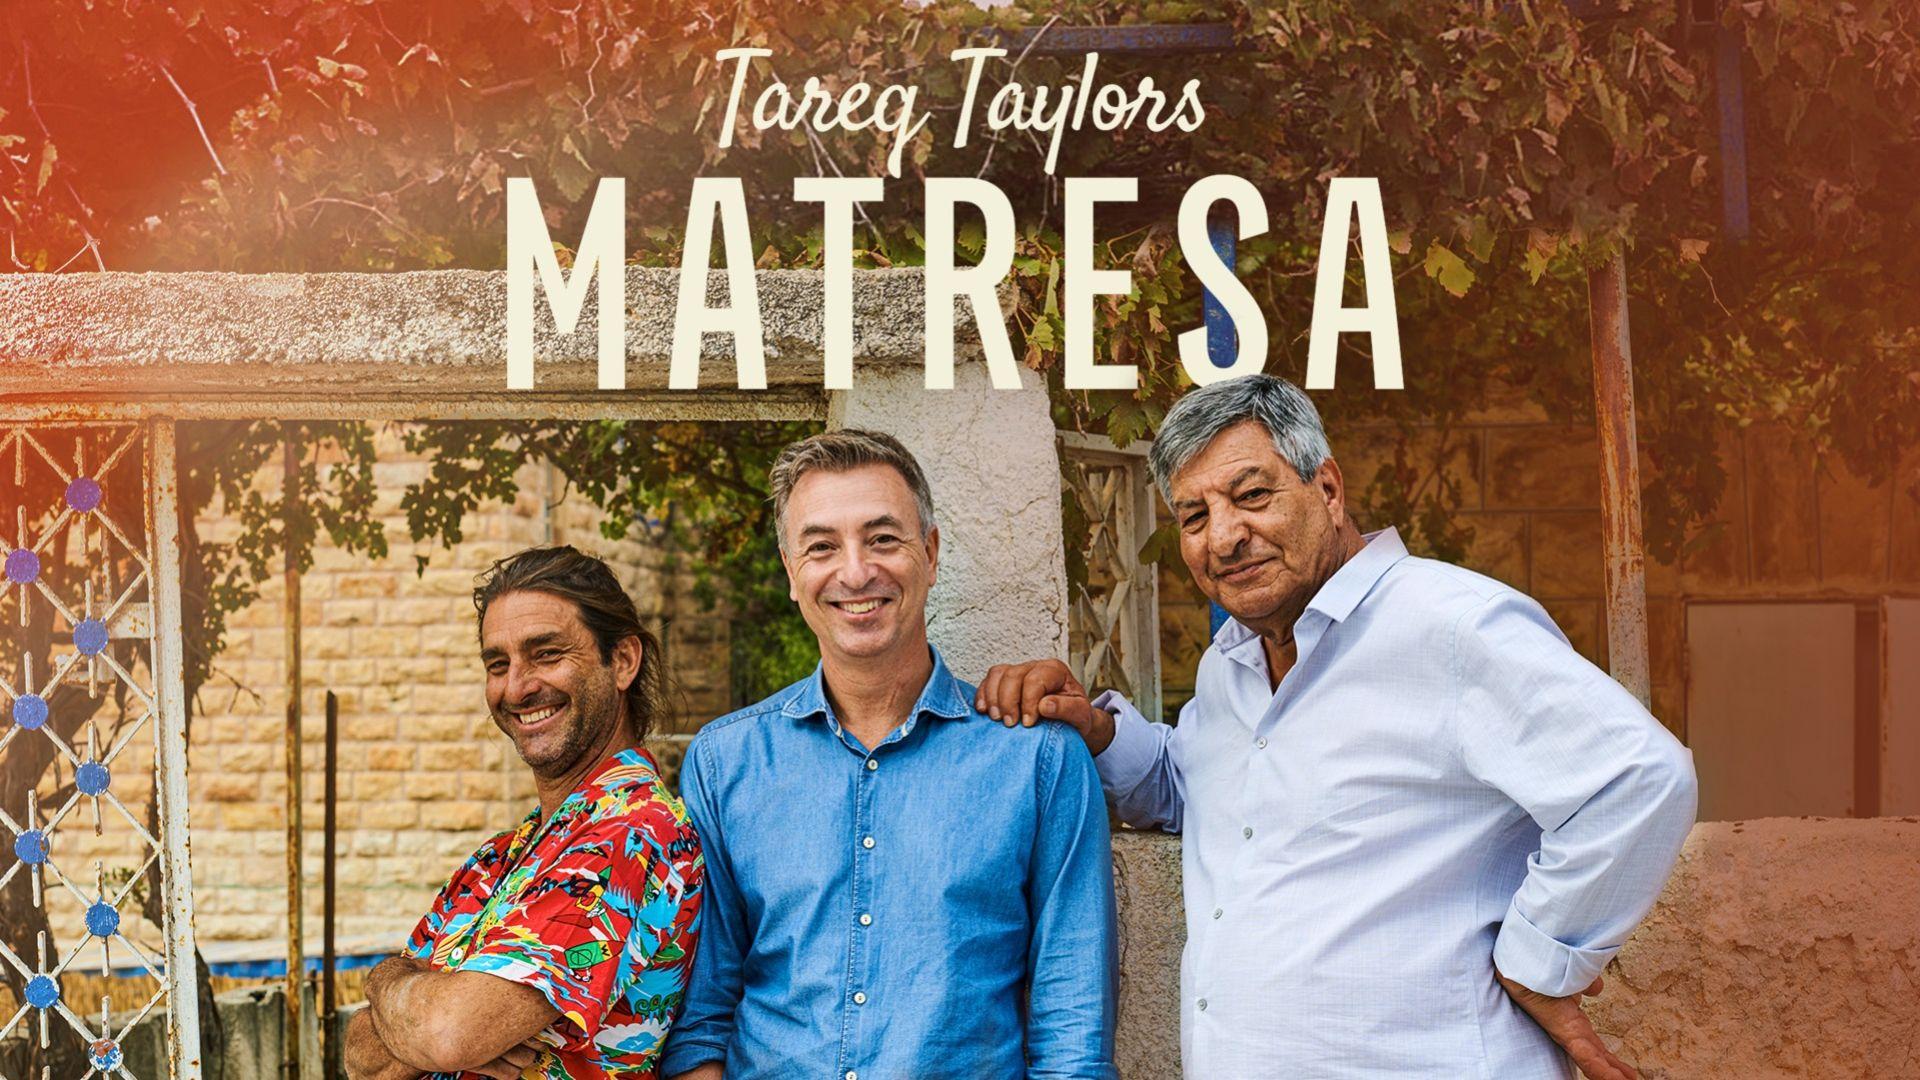 Ny matserie med Tareq Taylor